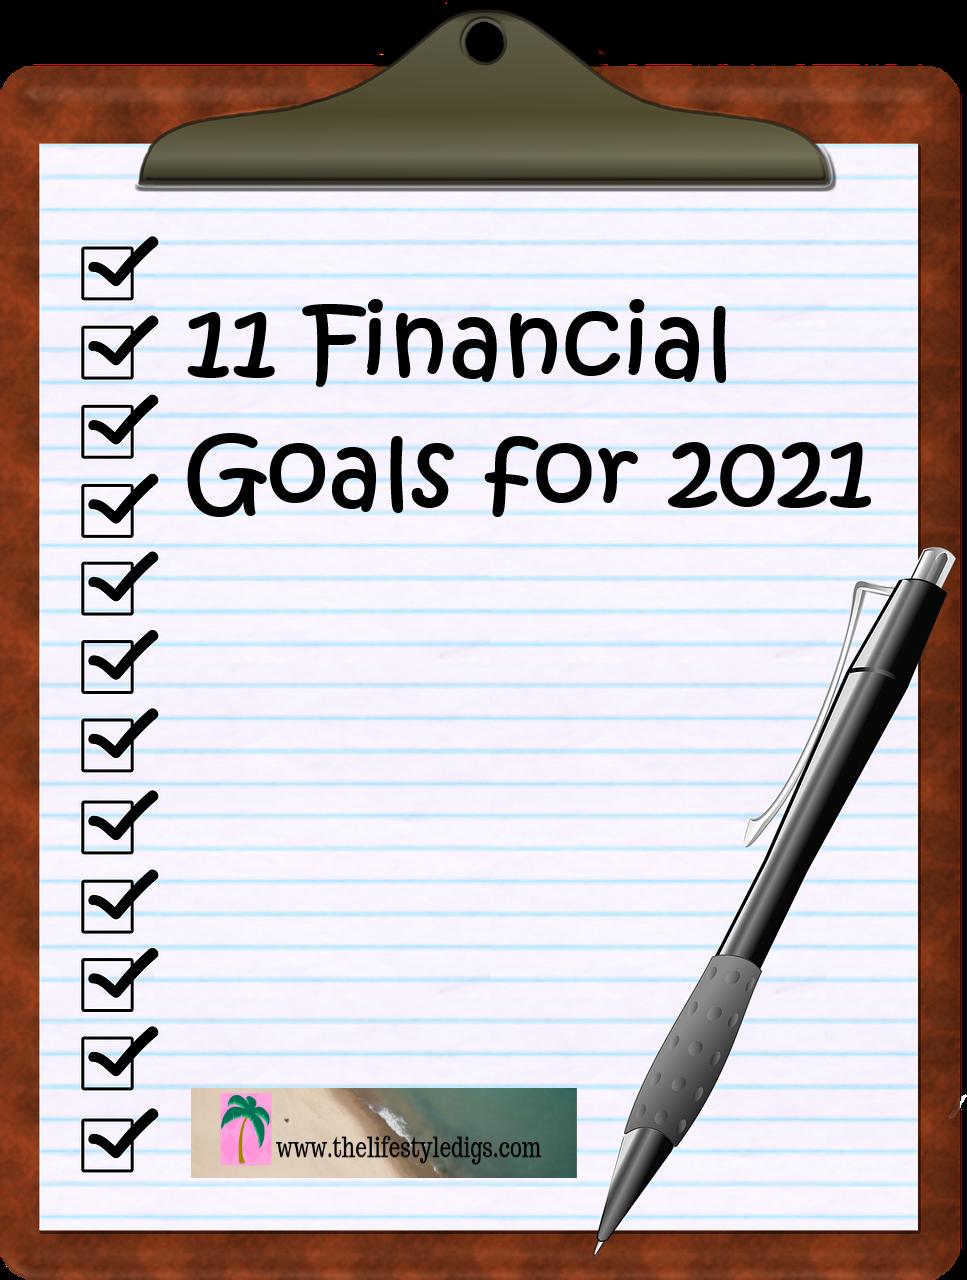 11 Financial Goals for 2021